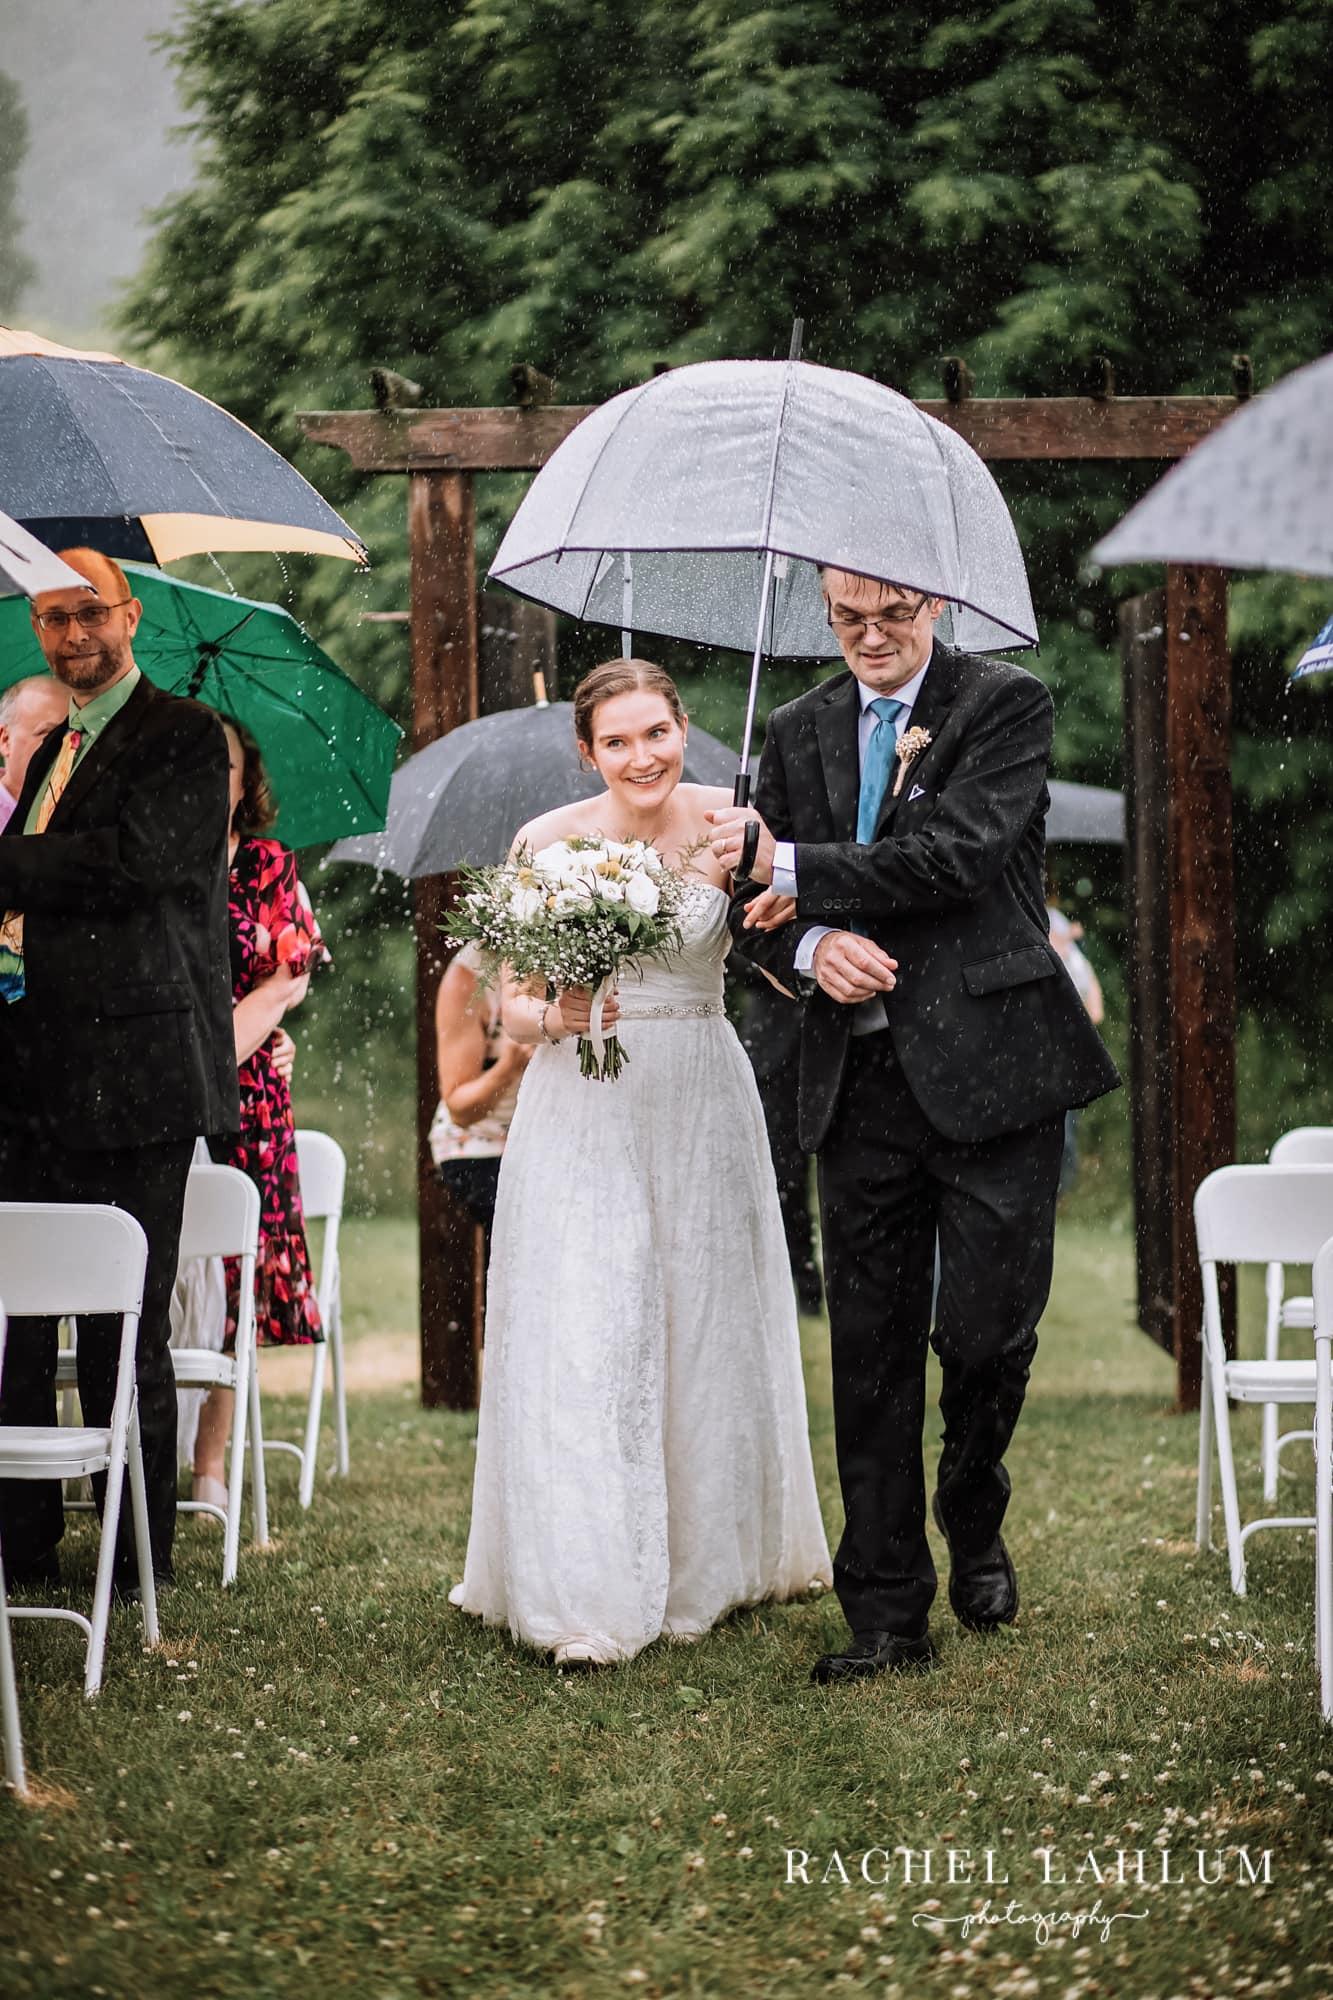 Father walks bride down the aisle under an umbrella during a downpour at Cedar Creek Barn.